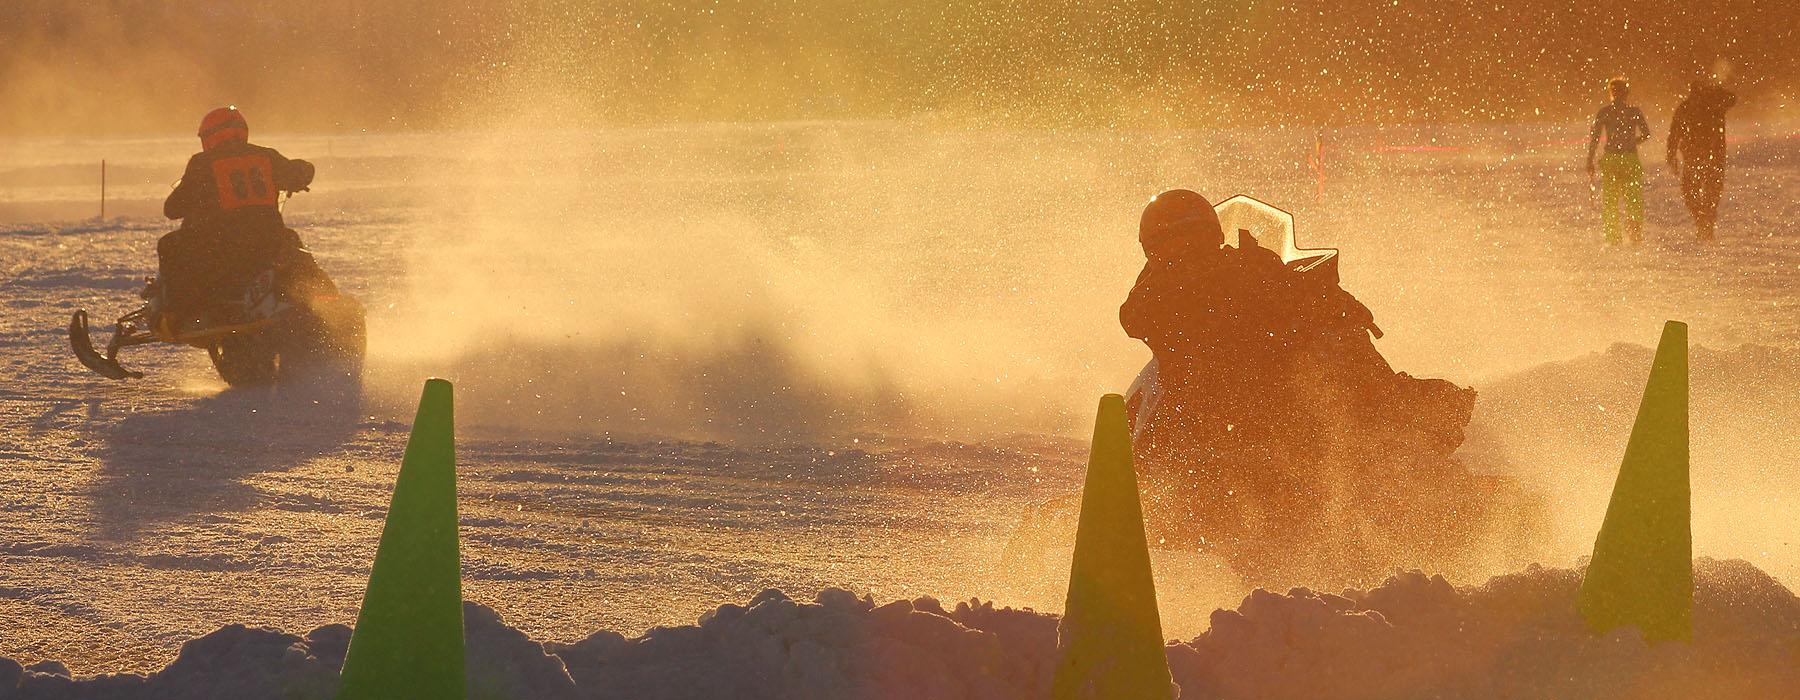 AMMC-Racing-by-Snowmachine-Racing-by-Roberta-Sampson-1